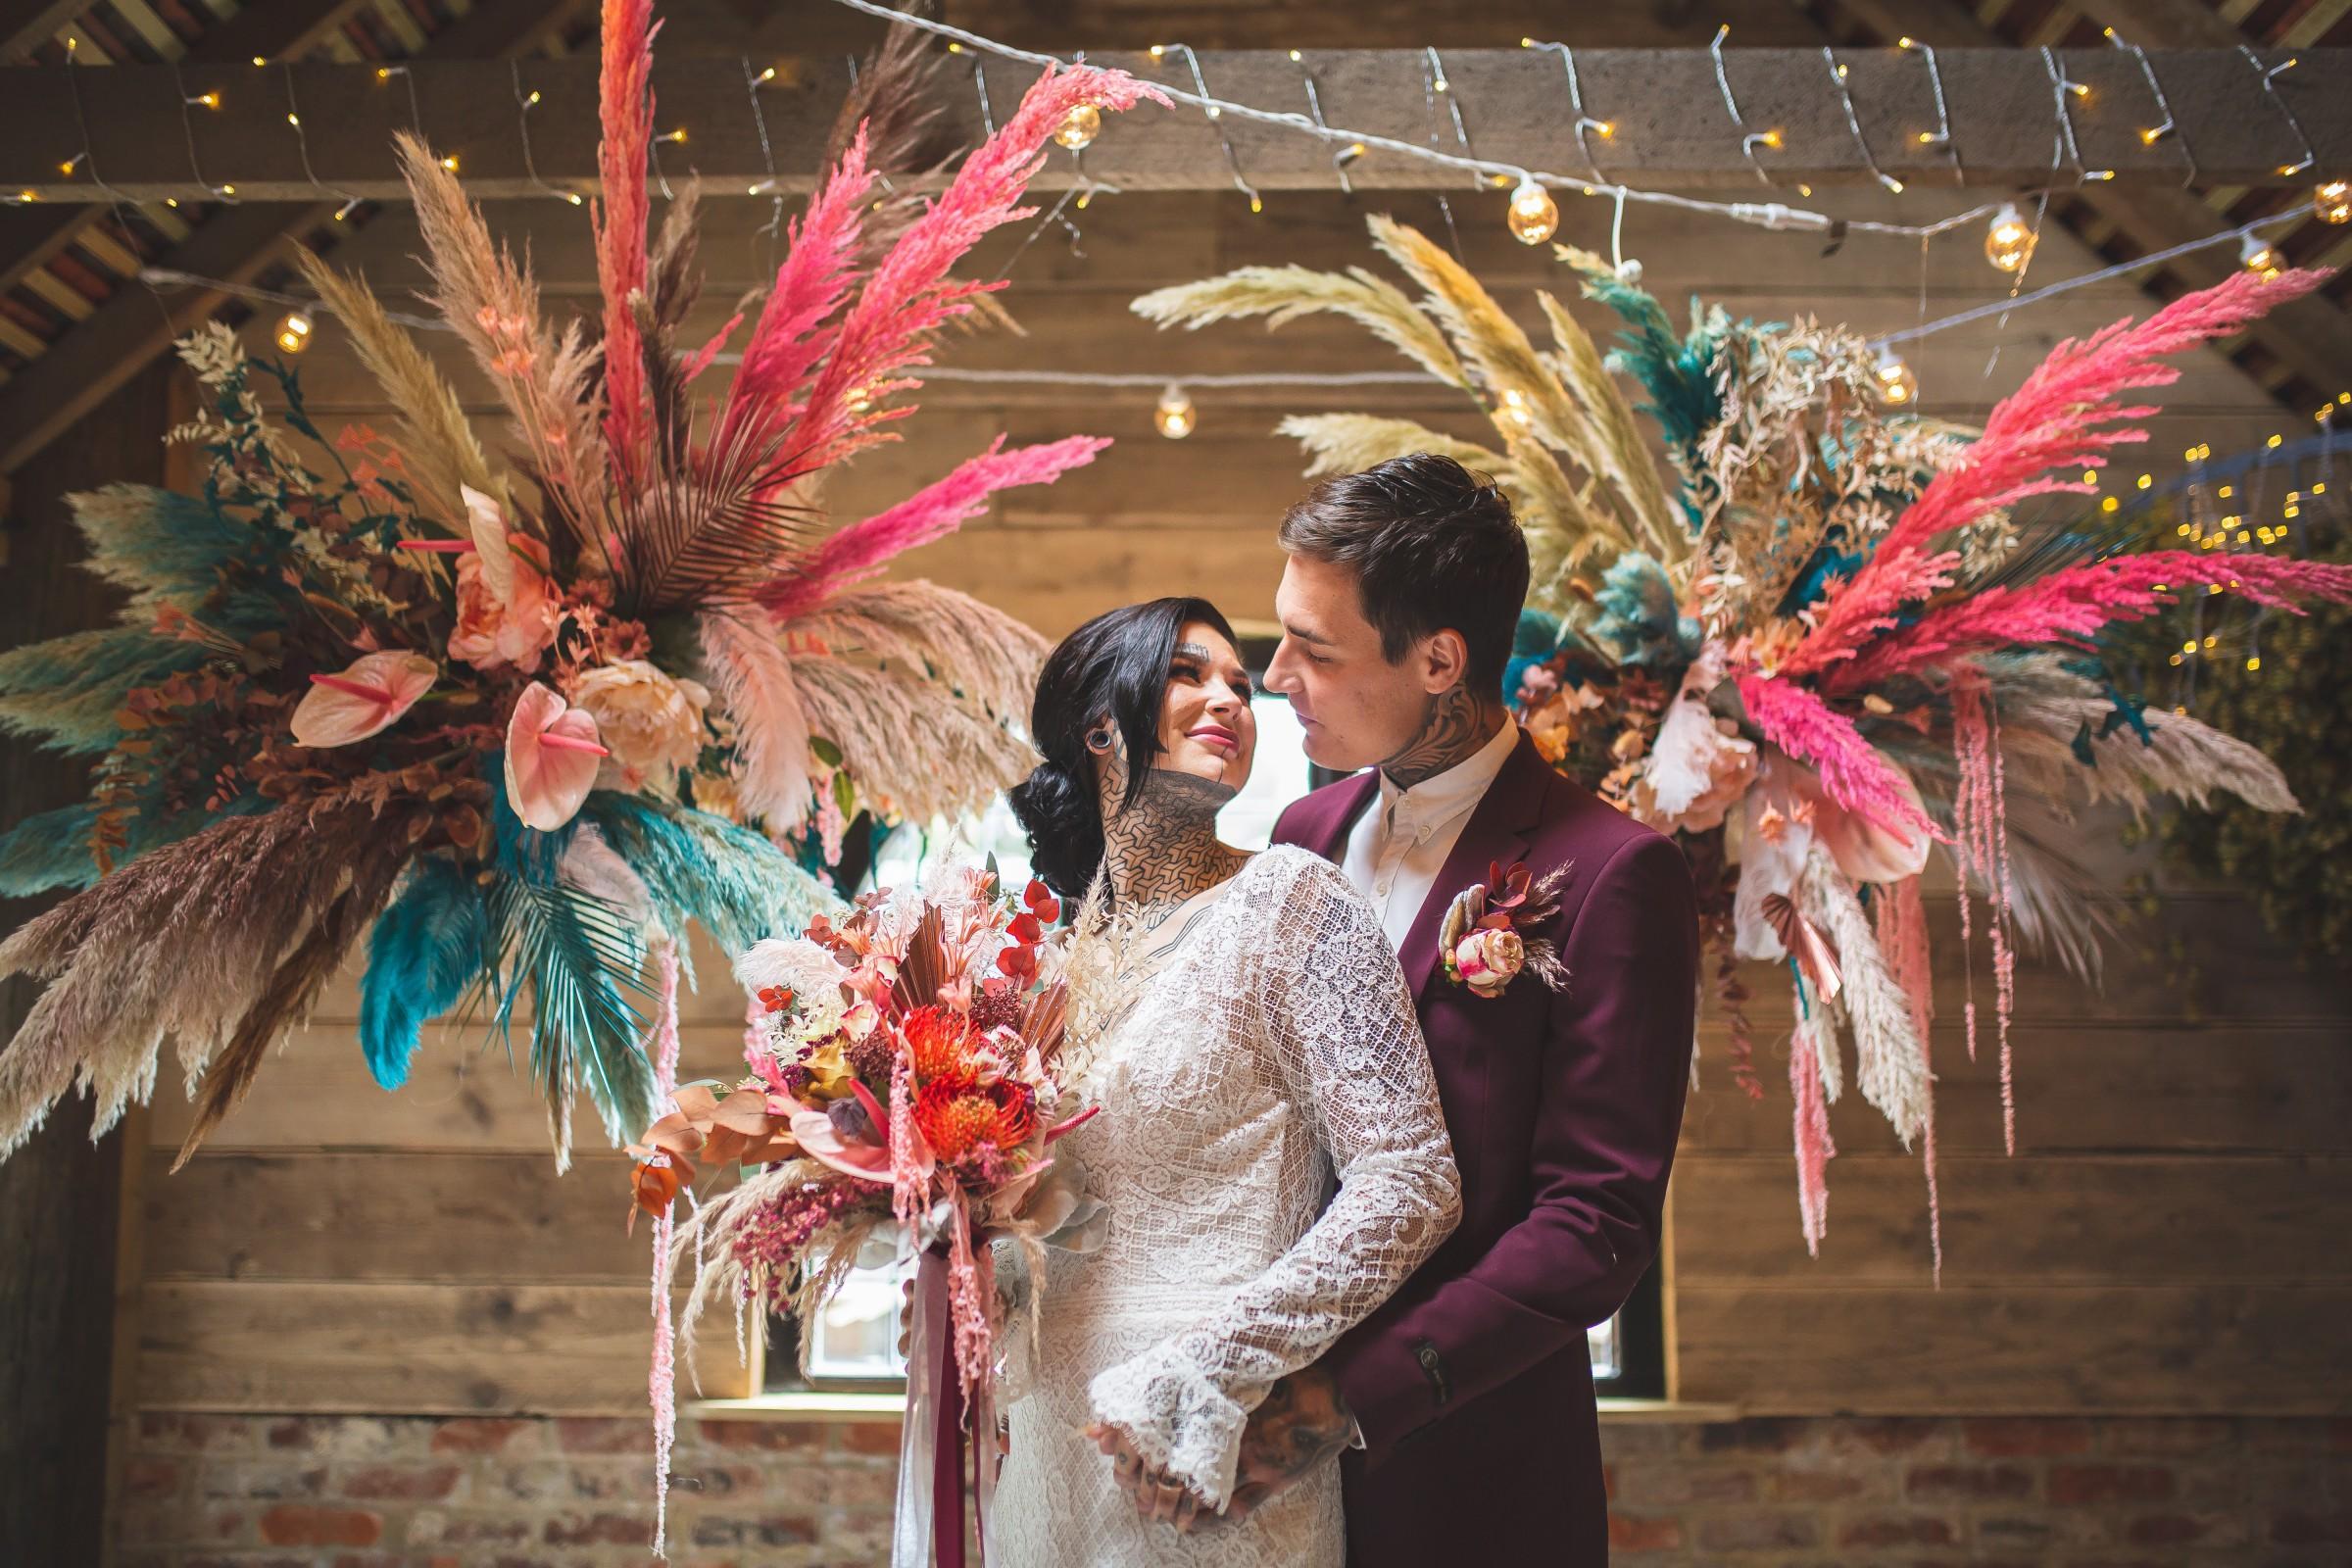 unique barn wedding - creative wedding styling - bright wedding - modern wedding - unique wedding flowers - colourful wedding flowers - alternative wedding - unconventional wedding